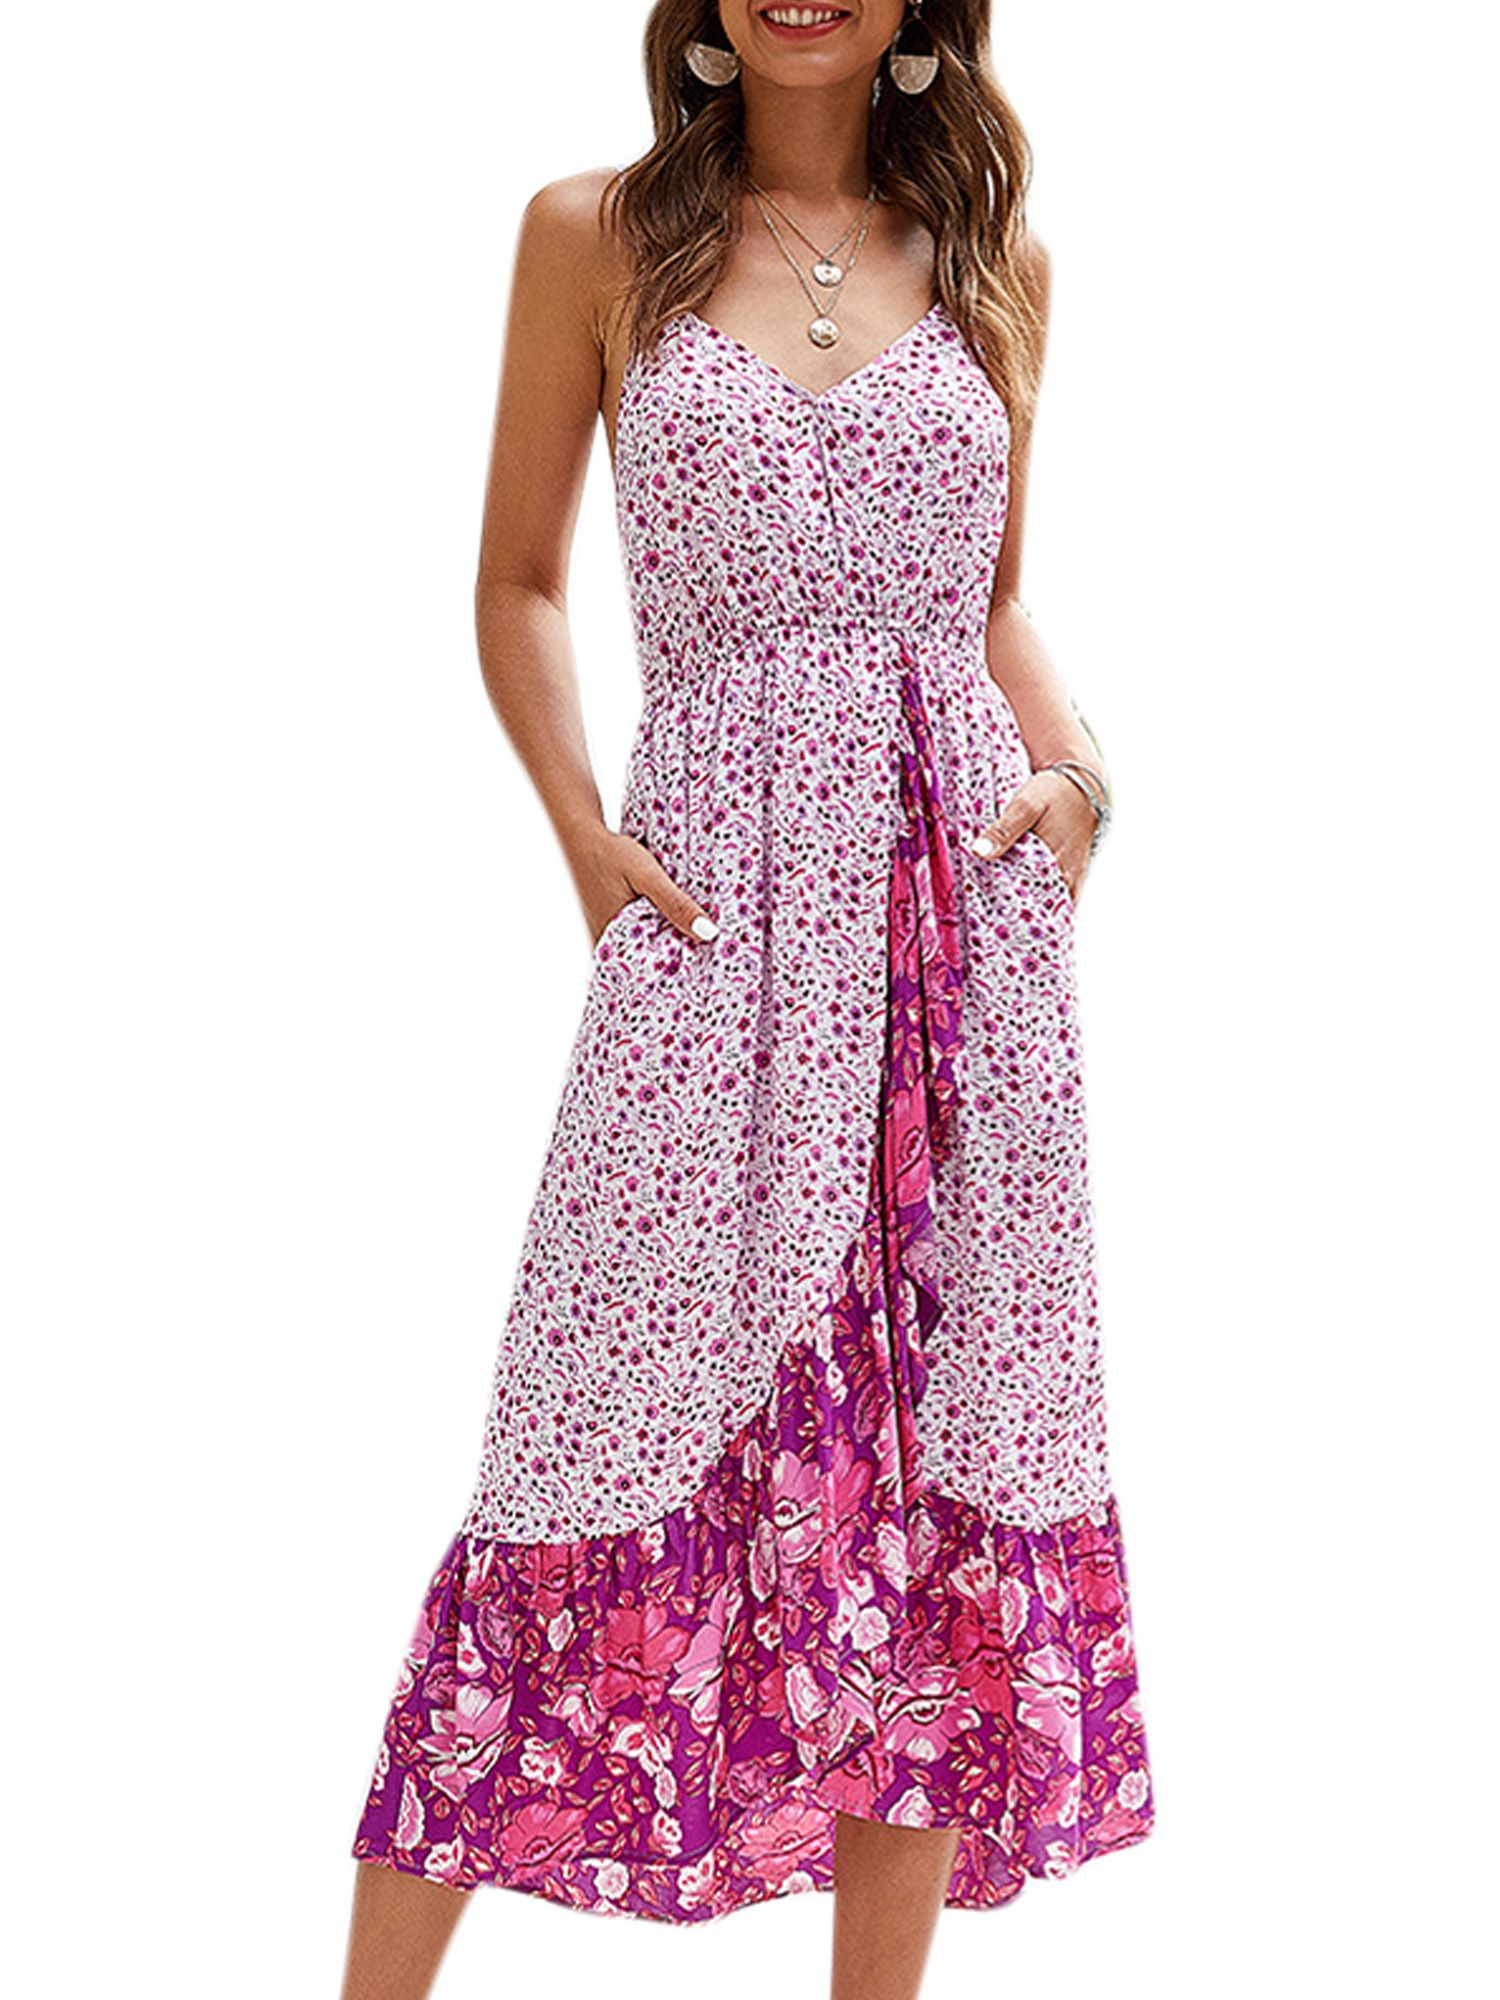 Pin By Serafina De Leon On Purple Pay Dresses Dresses Essential Dress Long Dress [ 2000 x 1500 Pixel ]